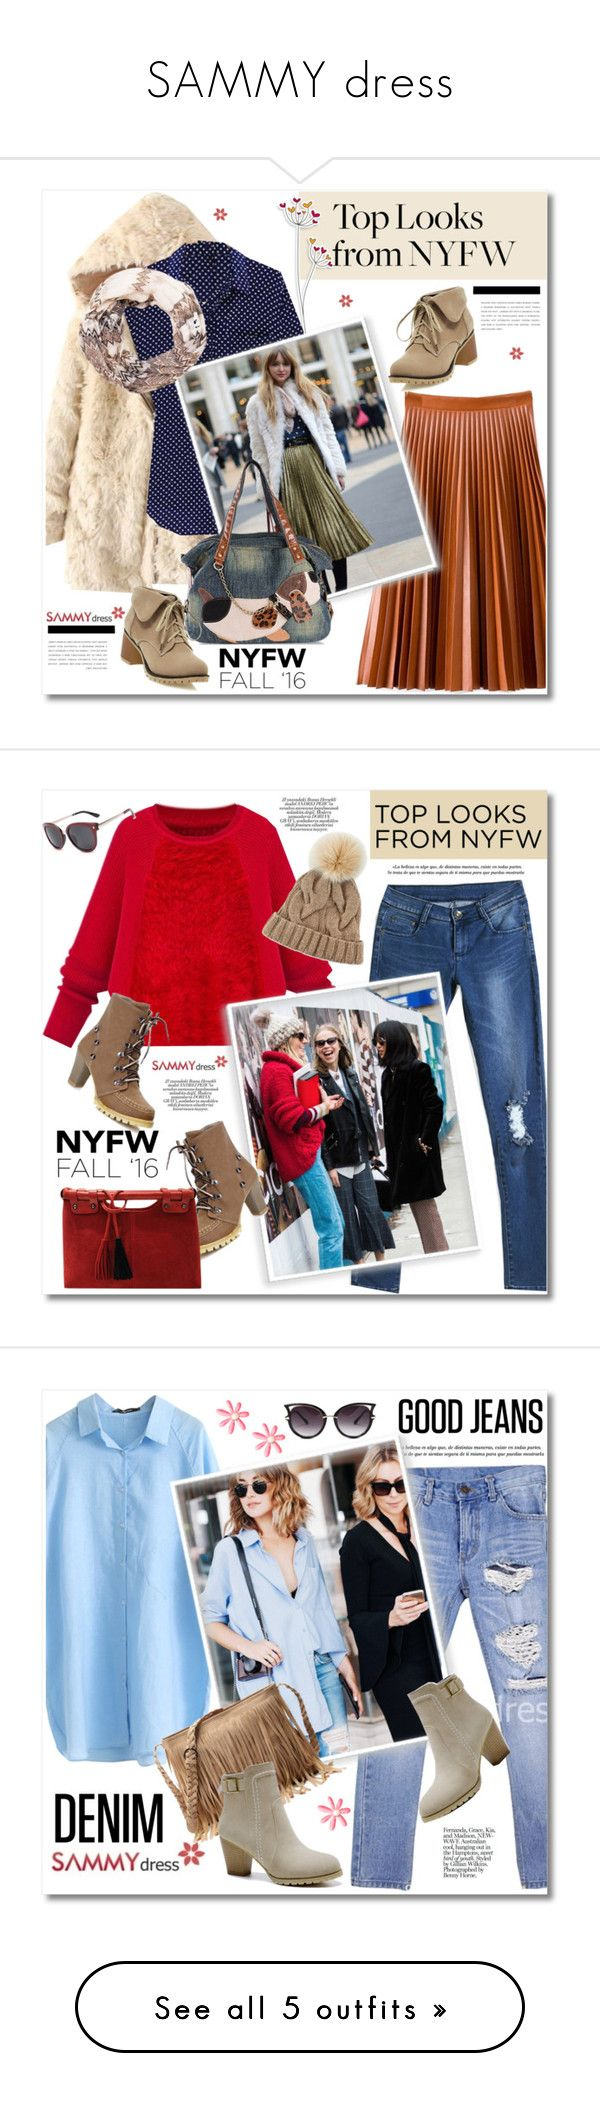 """SAMMY dress"" by svijetlana ❤ liked on Polyvore featuring women's clothing, women, female, woman, misses, juniors, NYFW, polyvoreeditorial, Loro Piana and sammydress"